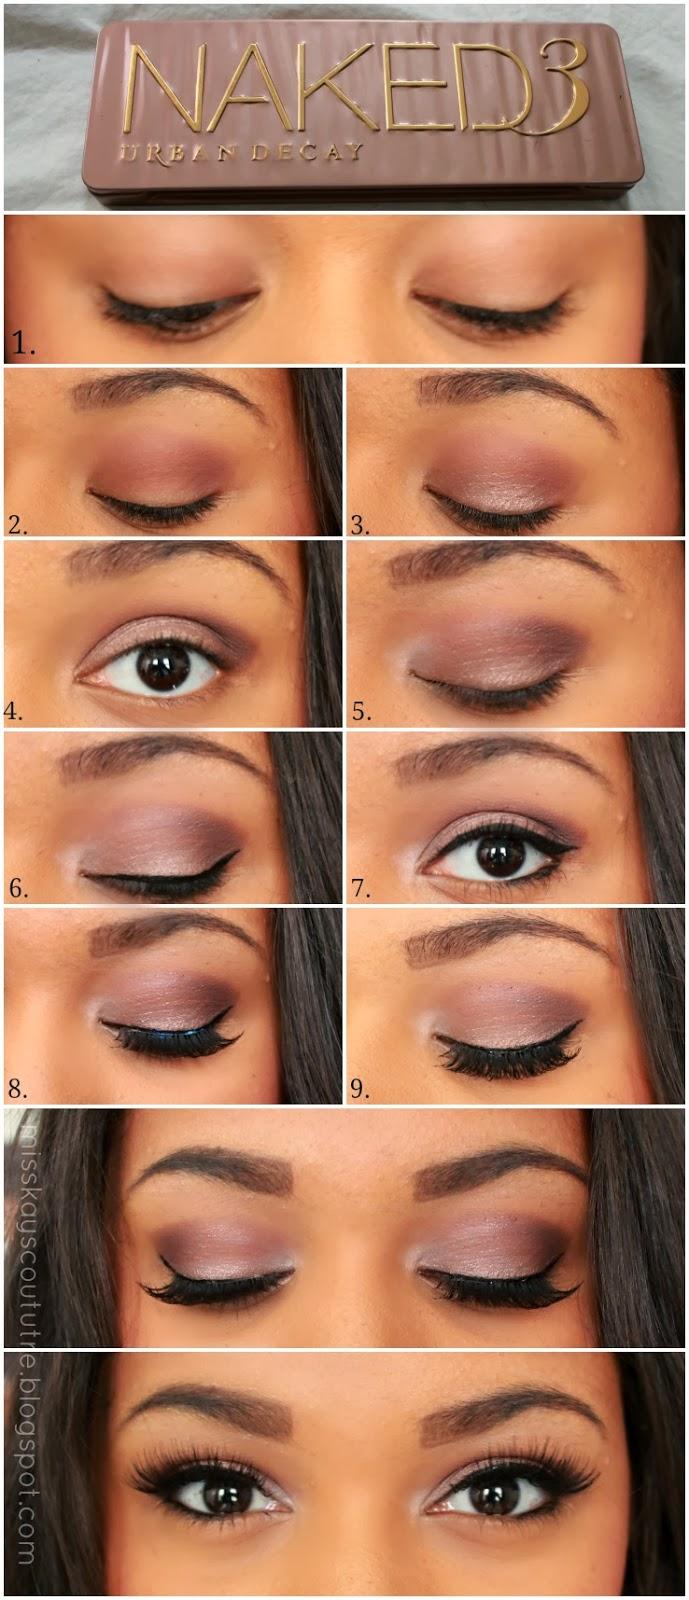 Naked Eyes Neutral Eyeshadow Guide: Pictorial: UD Naked 3 Smokey Eye